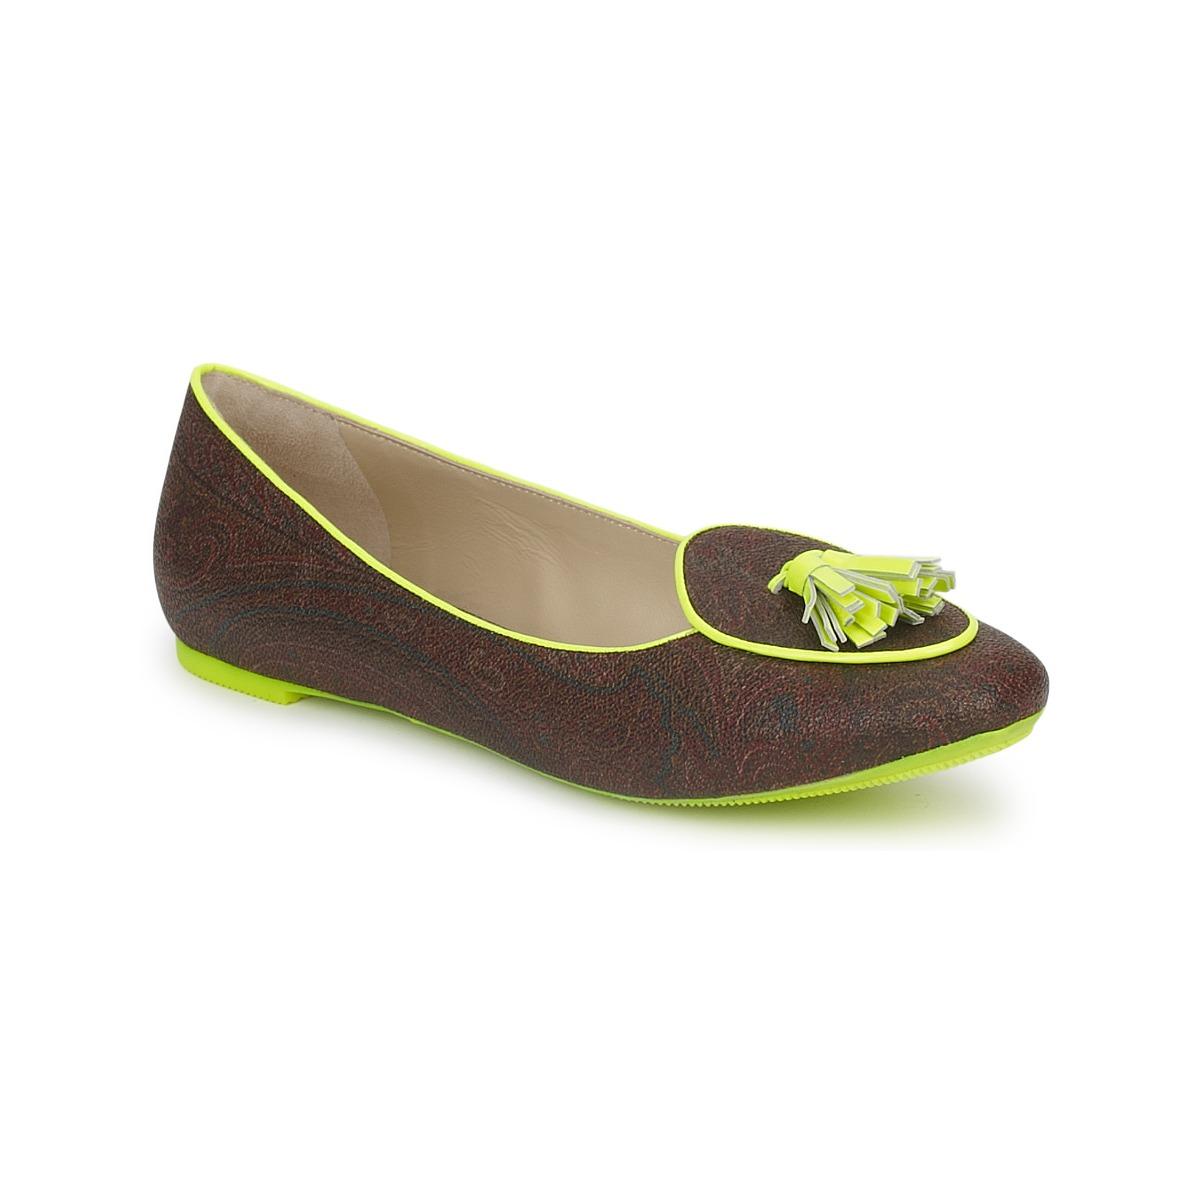 Smart-shoes Etro BALLERINE 3738 Brown / Citron